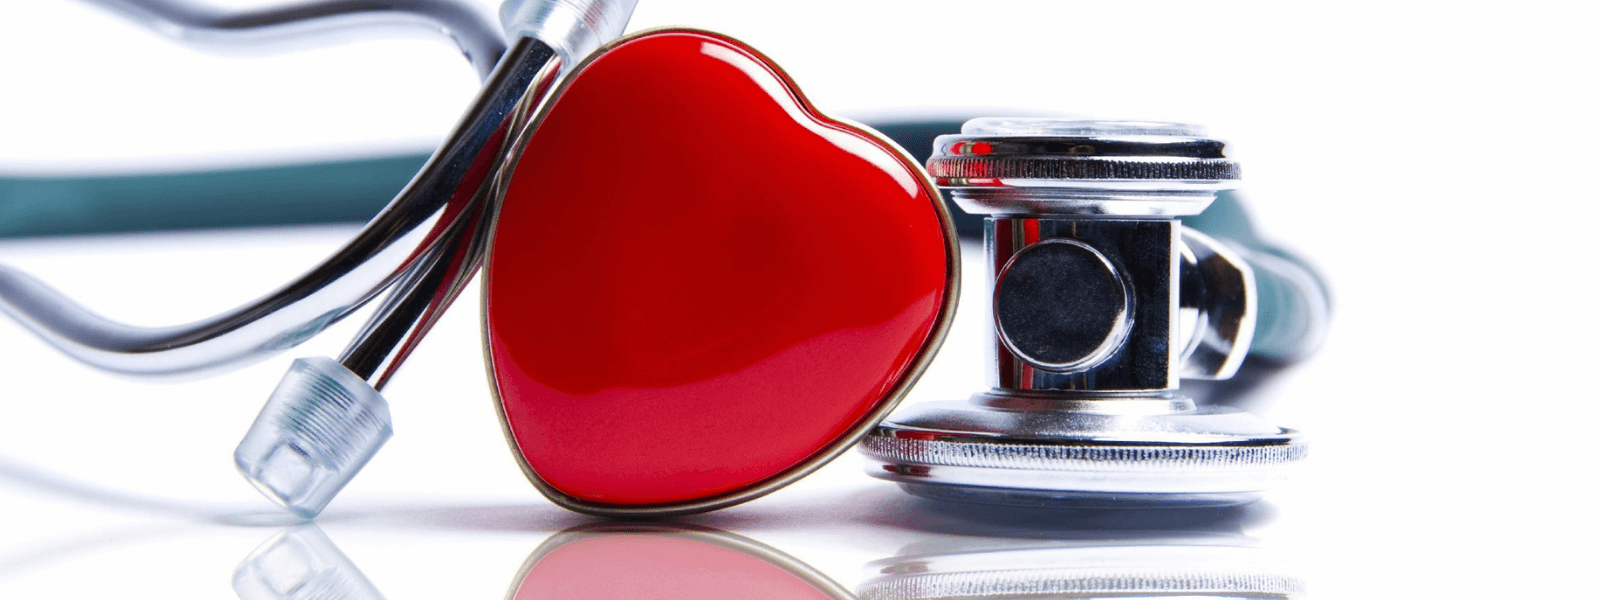 What You Should Do After an Autoimmune Disease Diagnosis